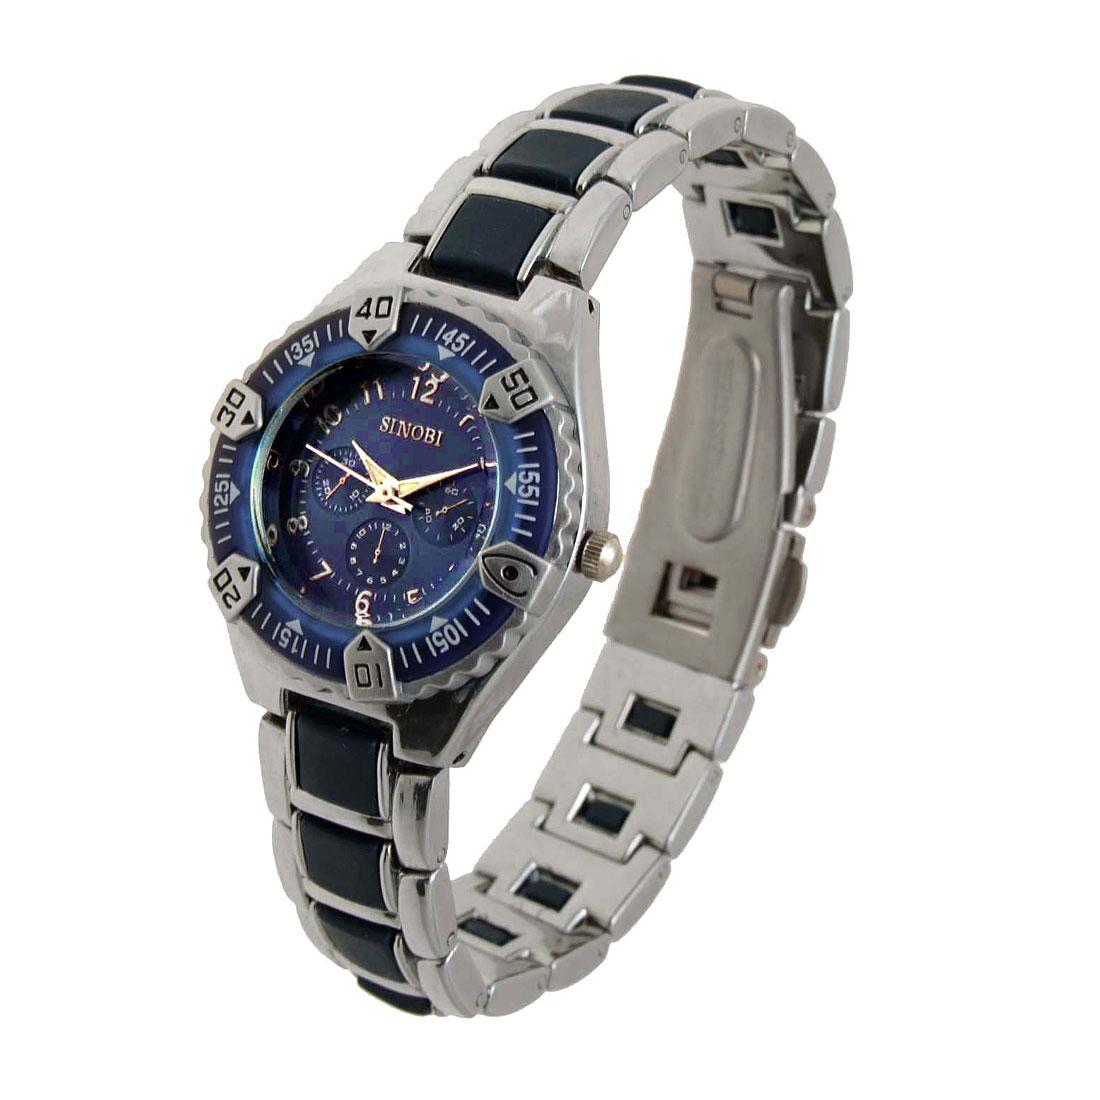 Fashion Jewelry Sports Night Vision Quartz Wrist Watch